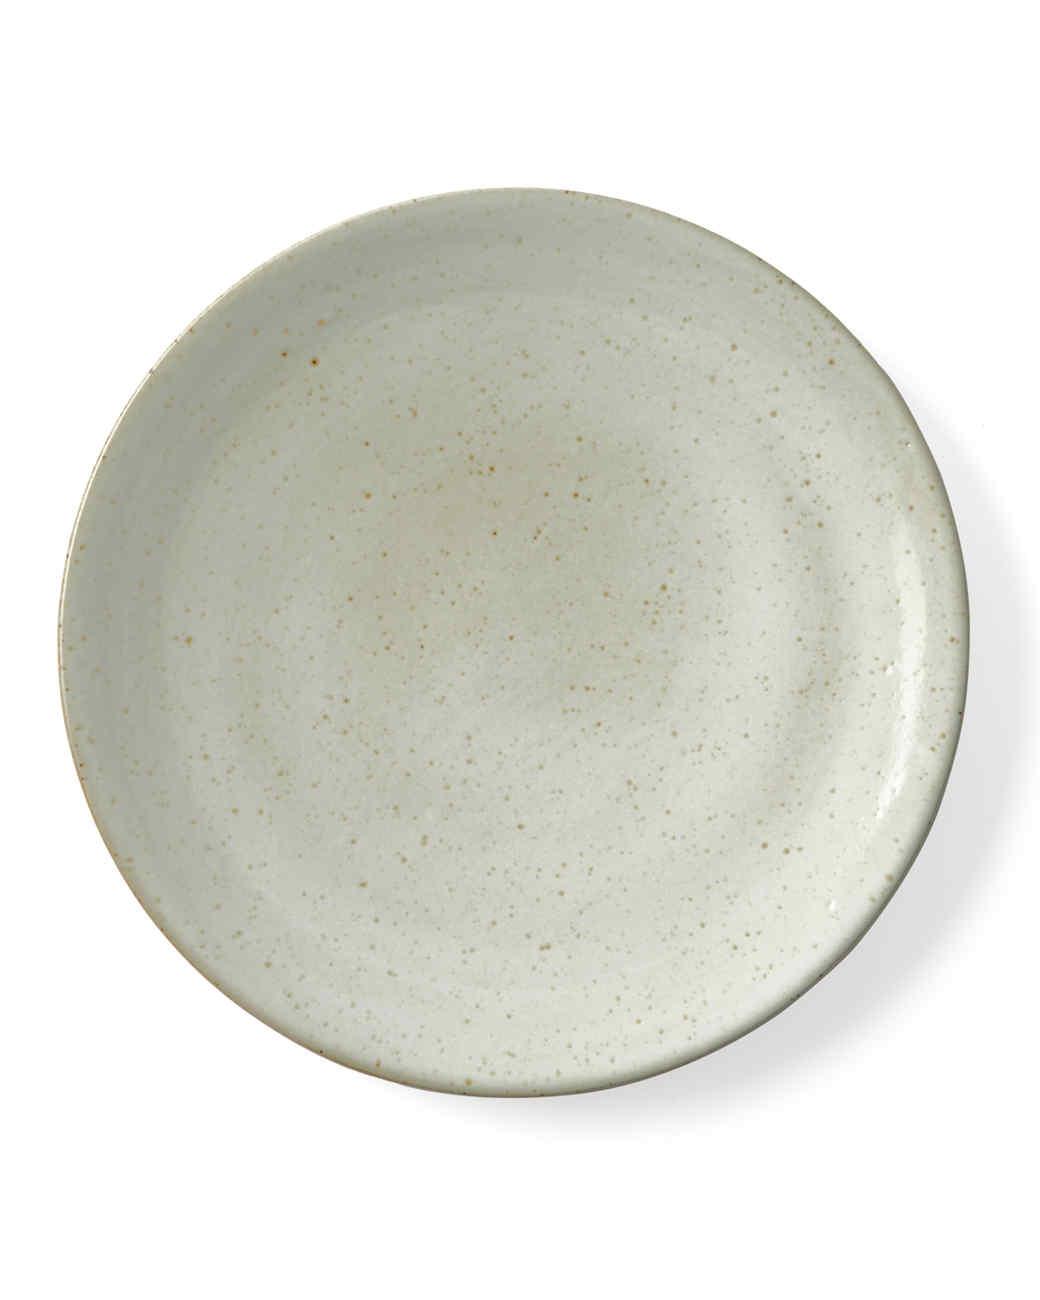 sue-fisher-plate-mld109068.jpg